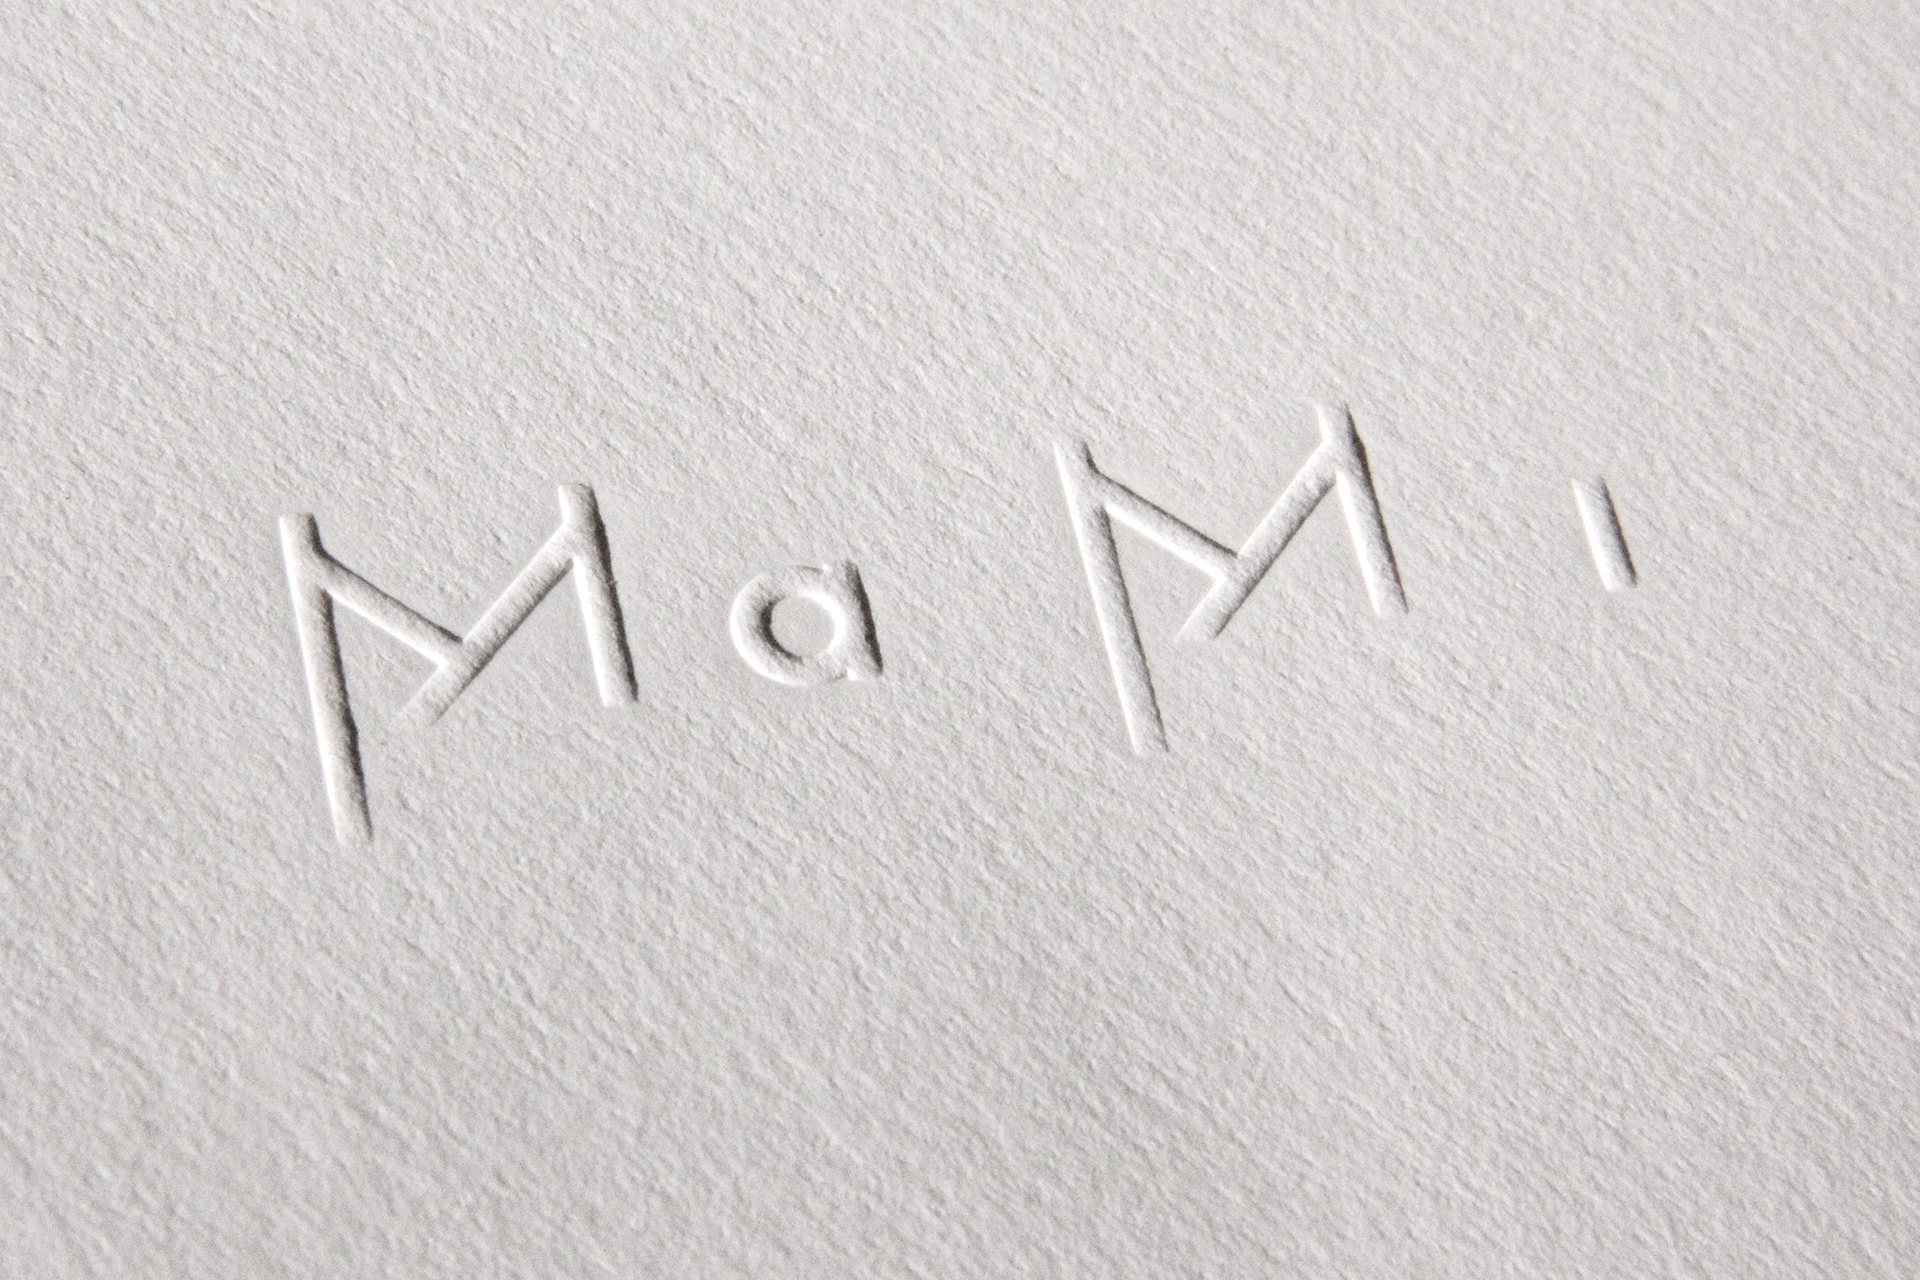 mami-p01